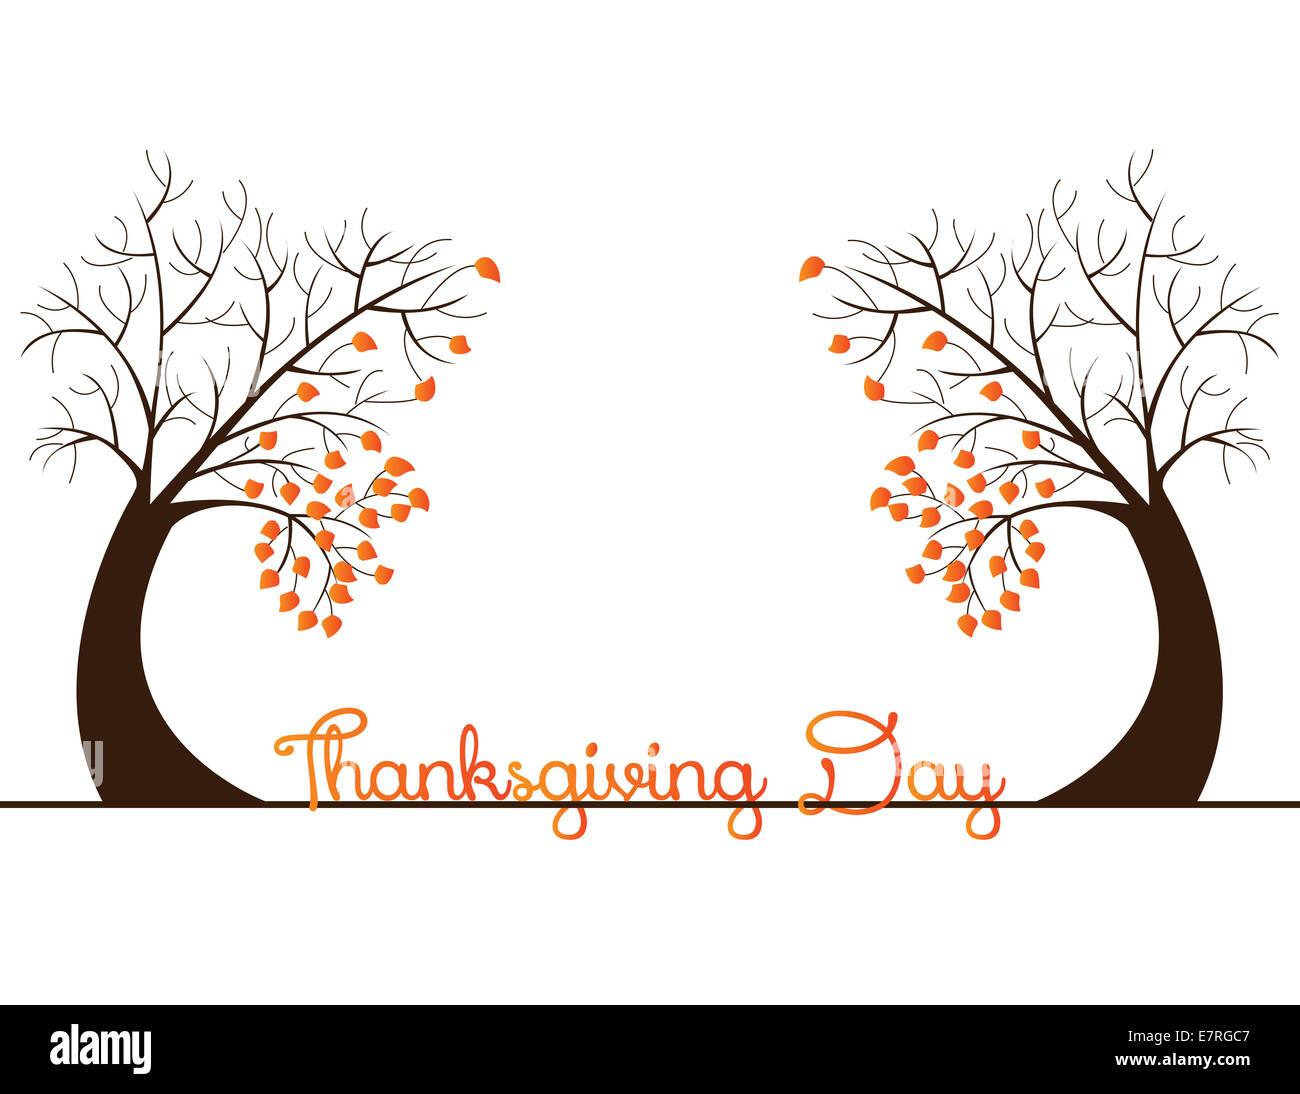 Thanksgiving-Hintergründe Stockbild